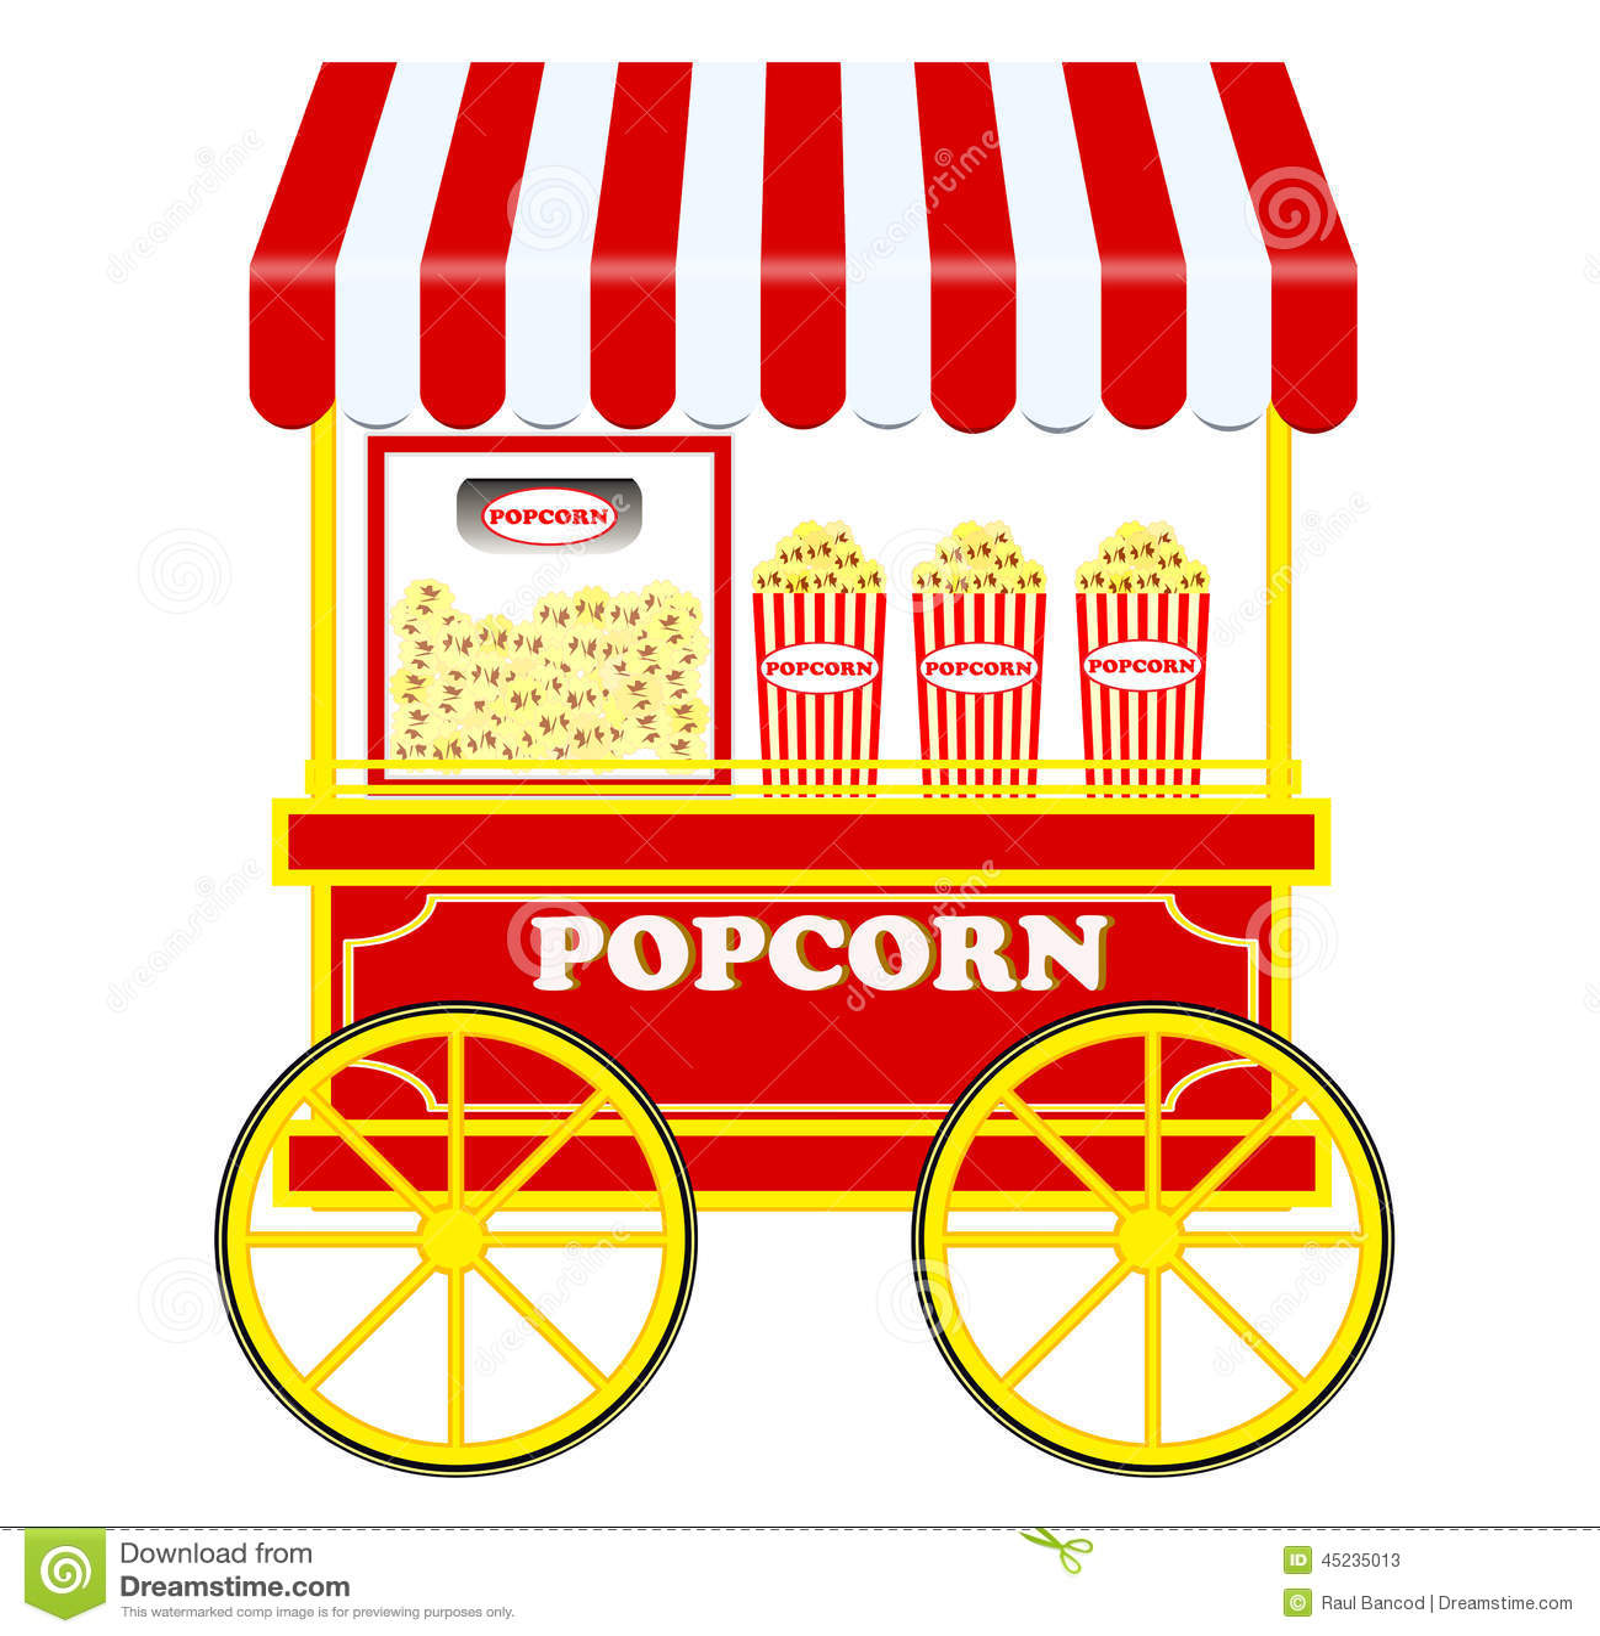 Popcorn Cart Stock Image Illustration Of Illustration